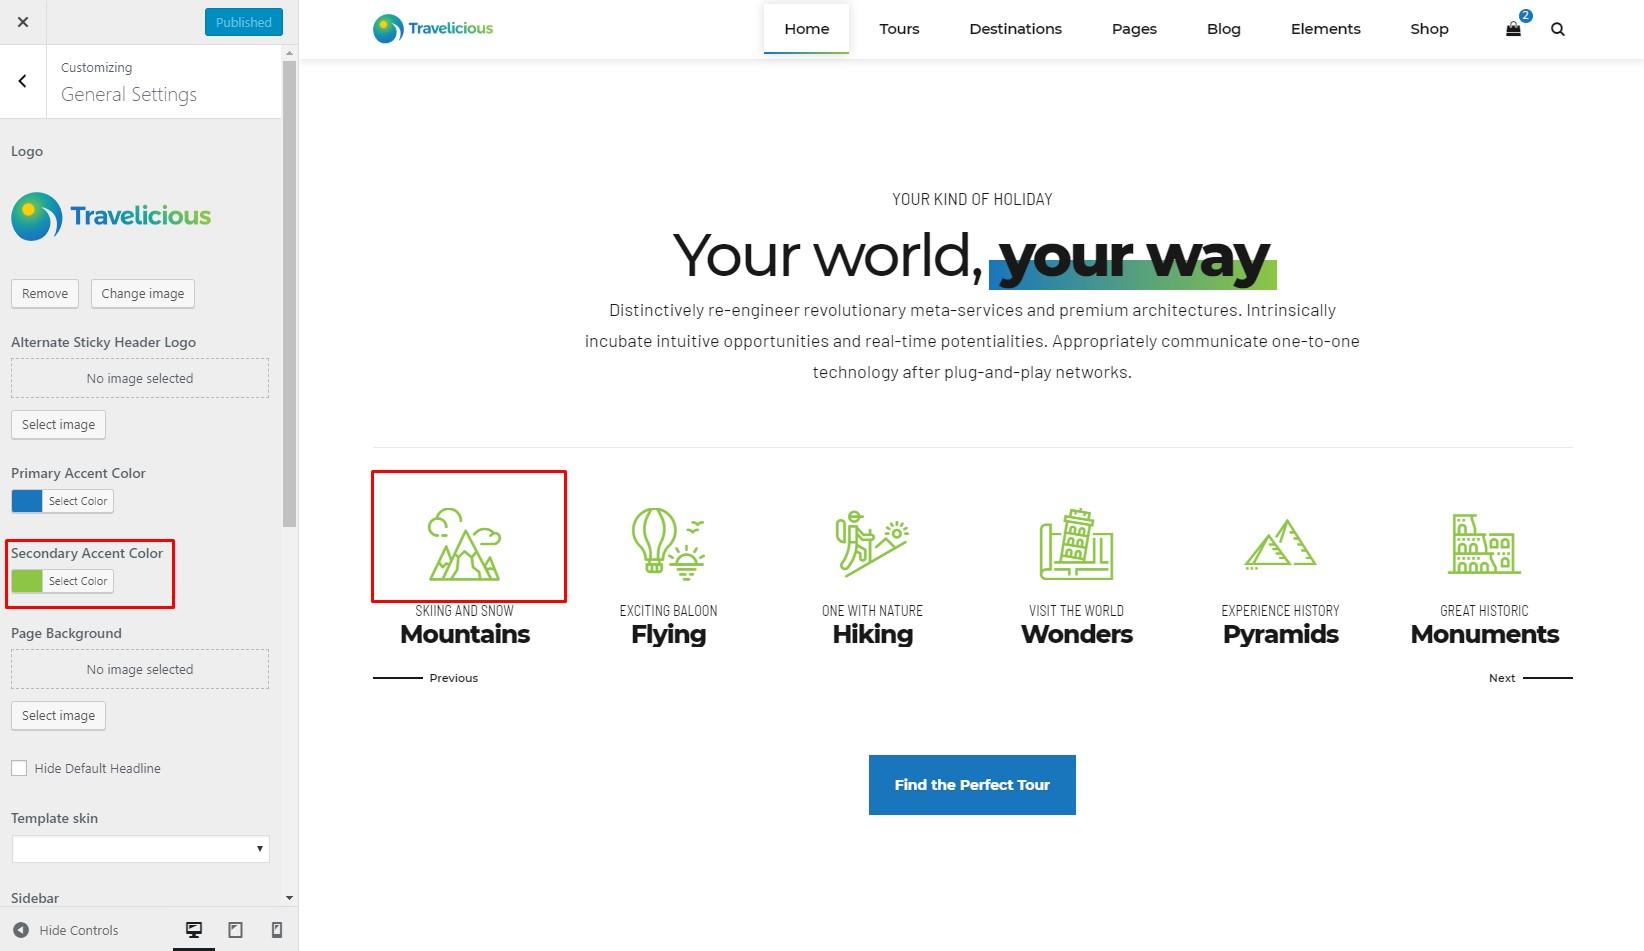 https://documentation.bold-themes.com/travelicious/wp-content/uploads/sites/37/2018/10/alt-color.jpg